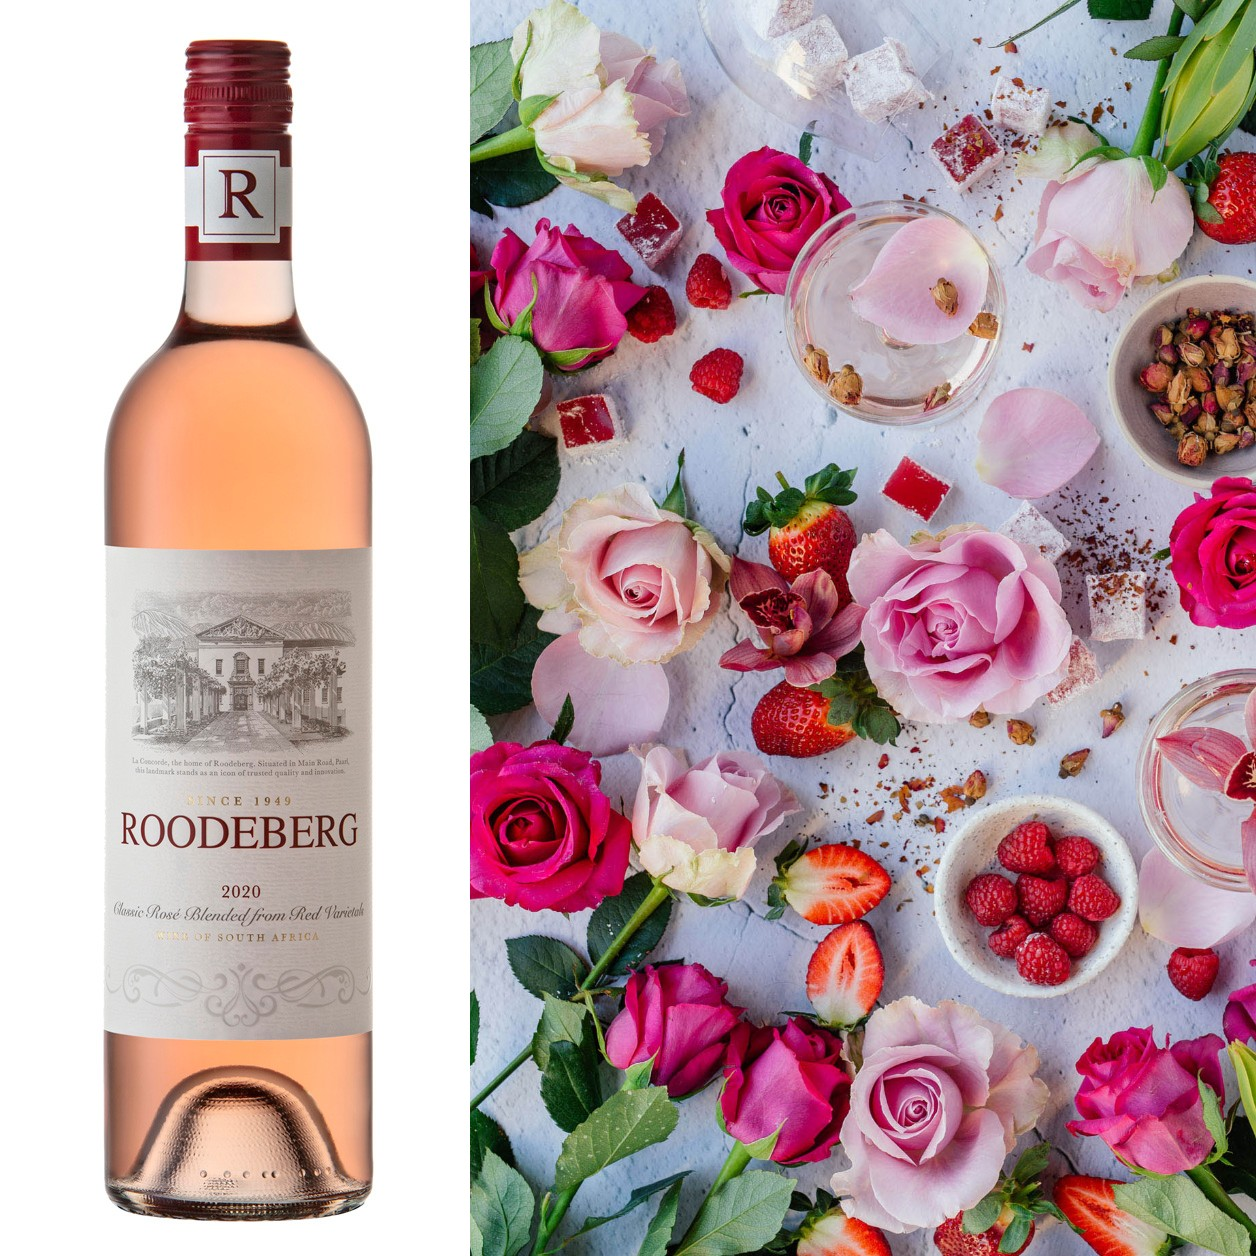 Revitalised Roodeberg Classic Rosé In Full Bloom For Spring photo